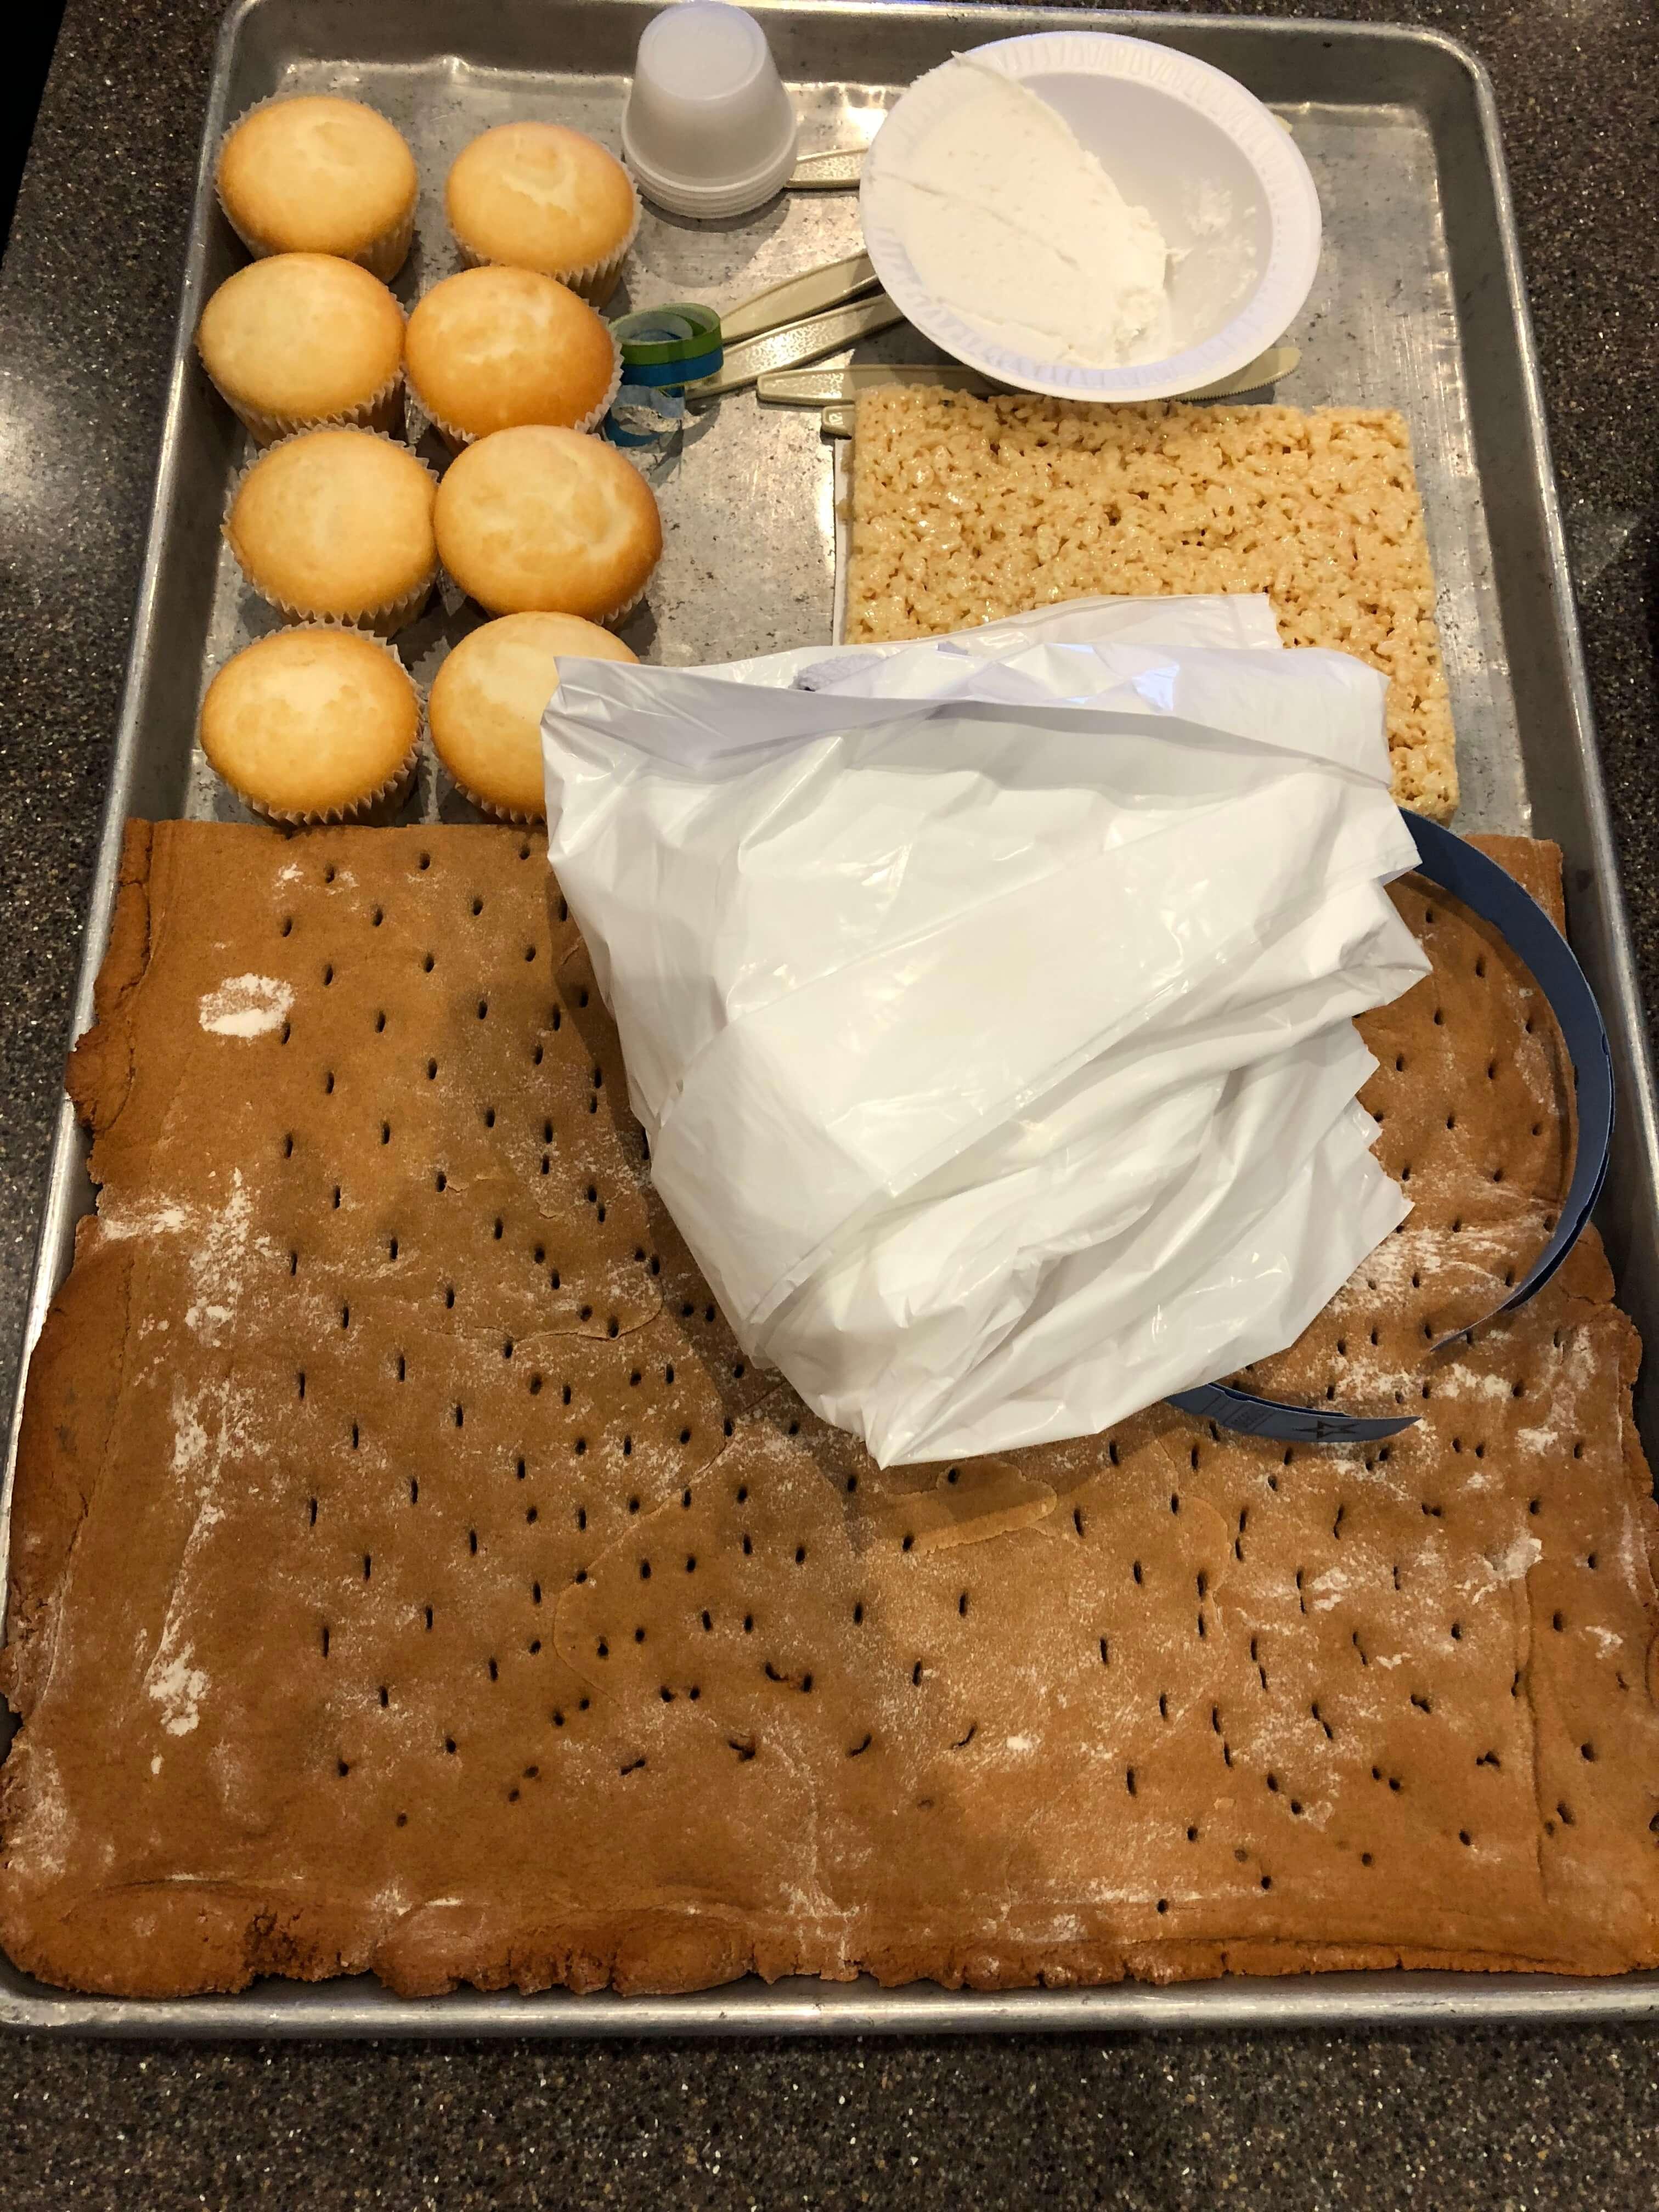 woodloch baking contest